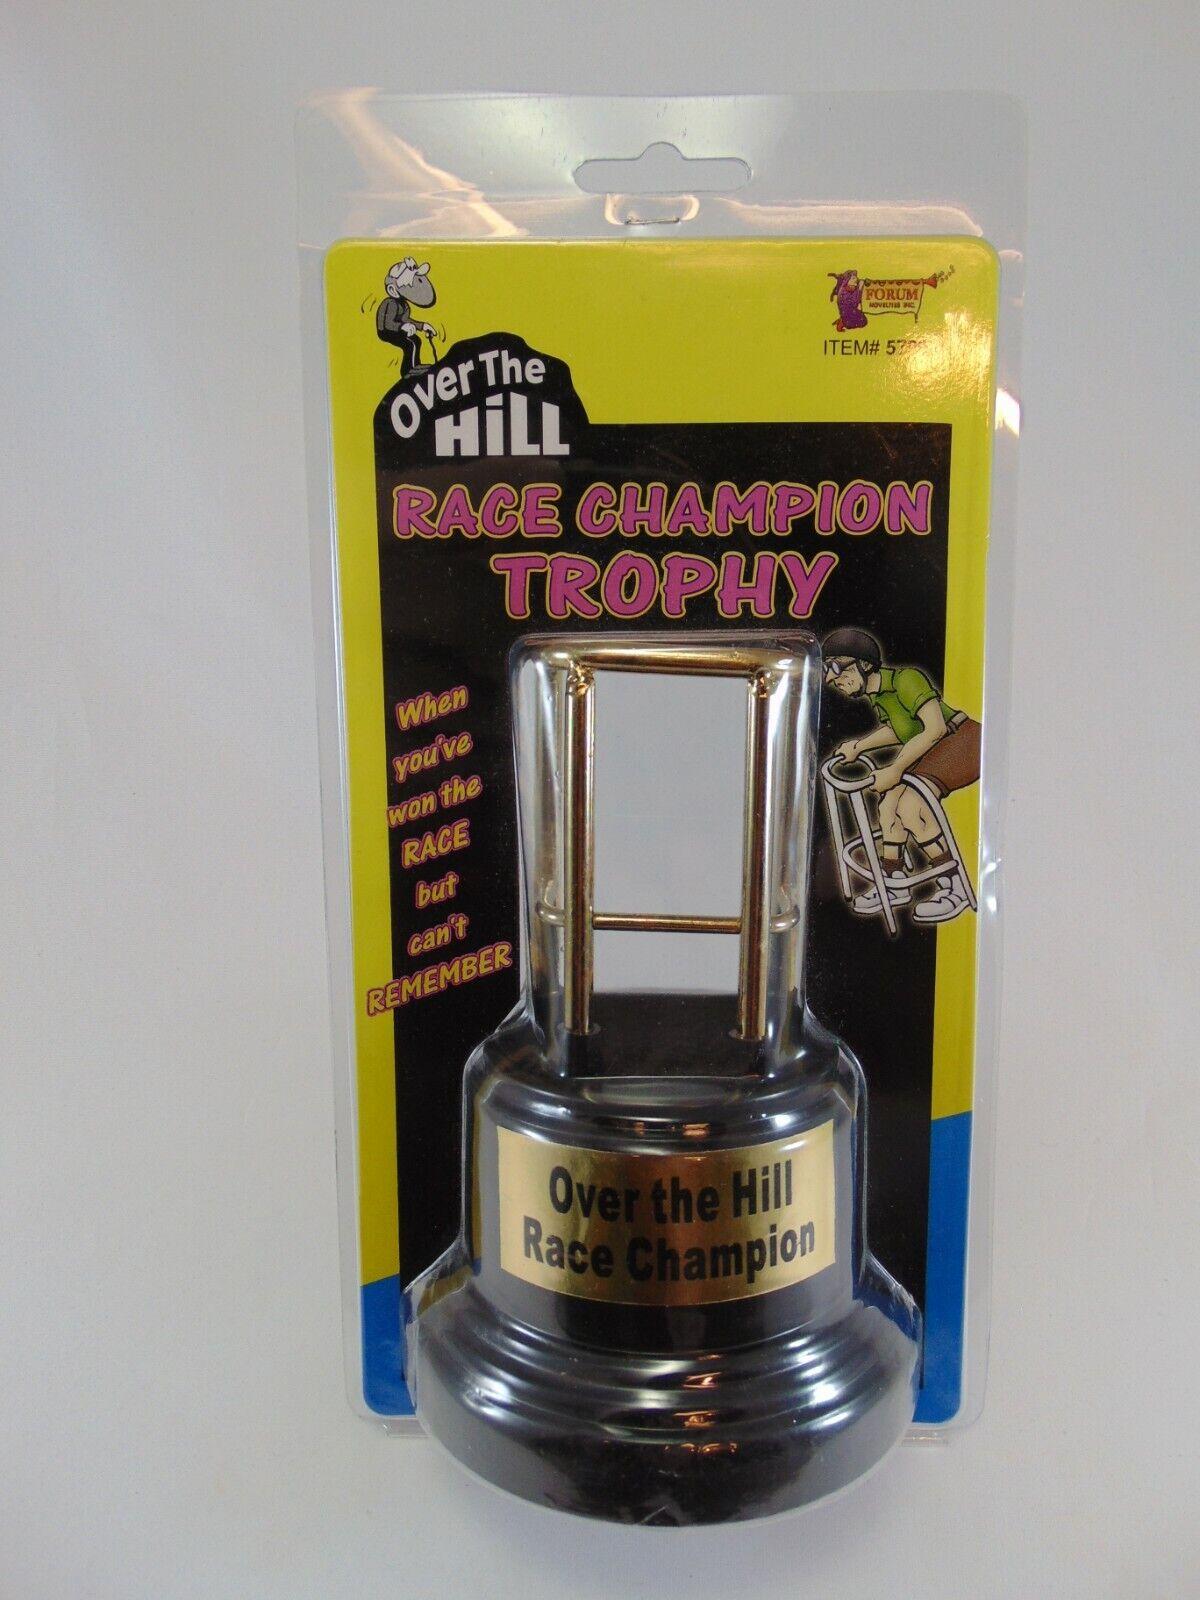 Over The HIll Race Champion Trophy forum novelties vintage g